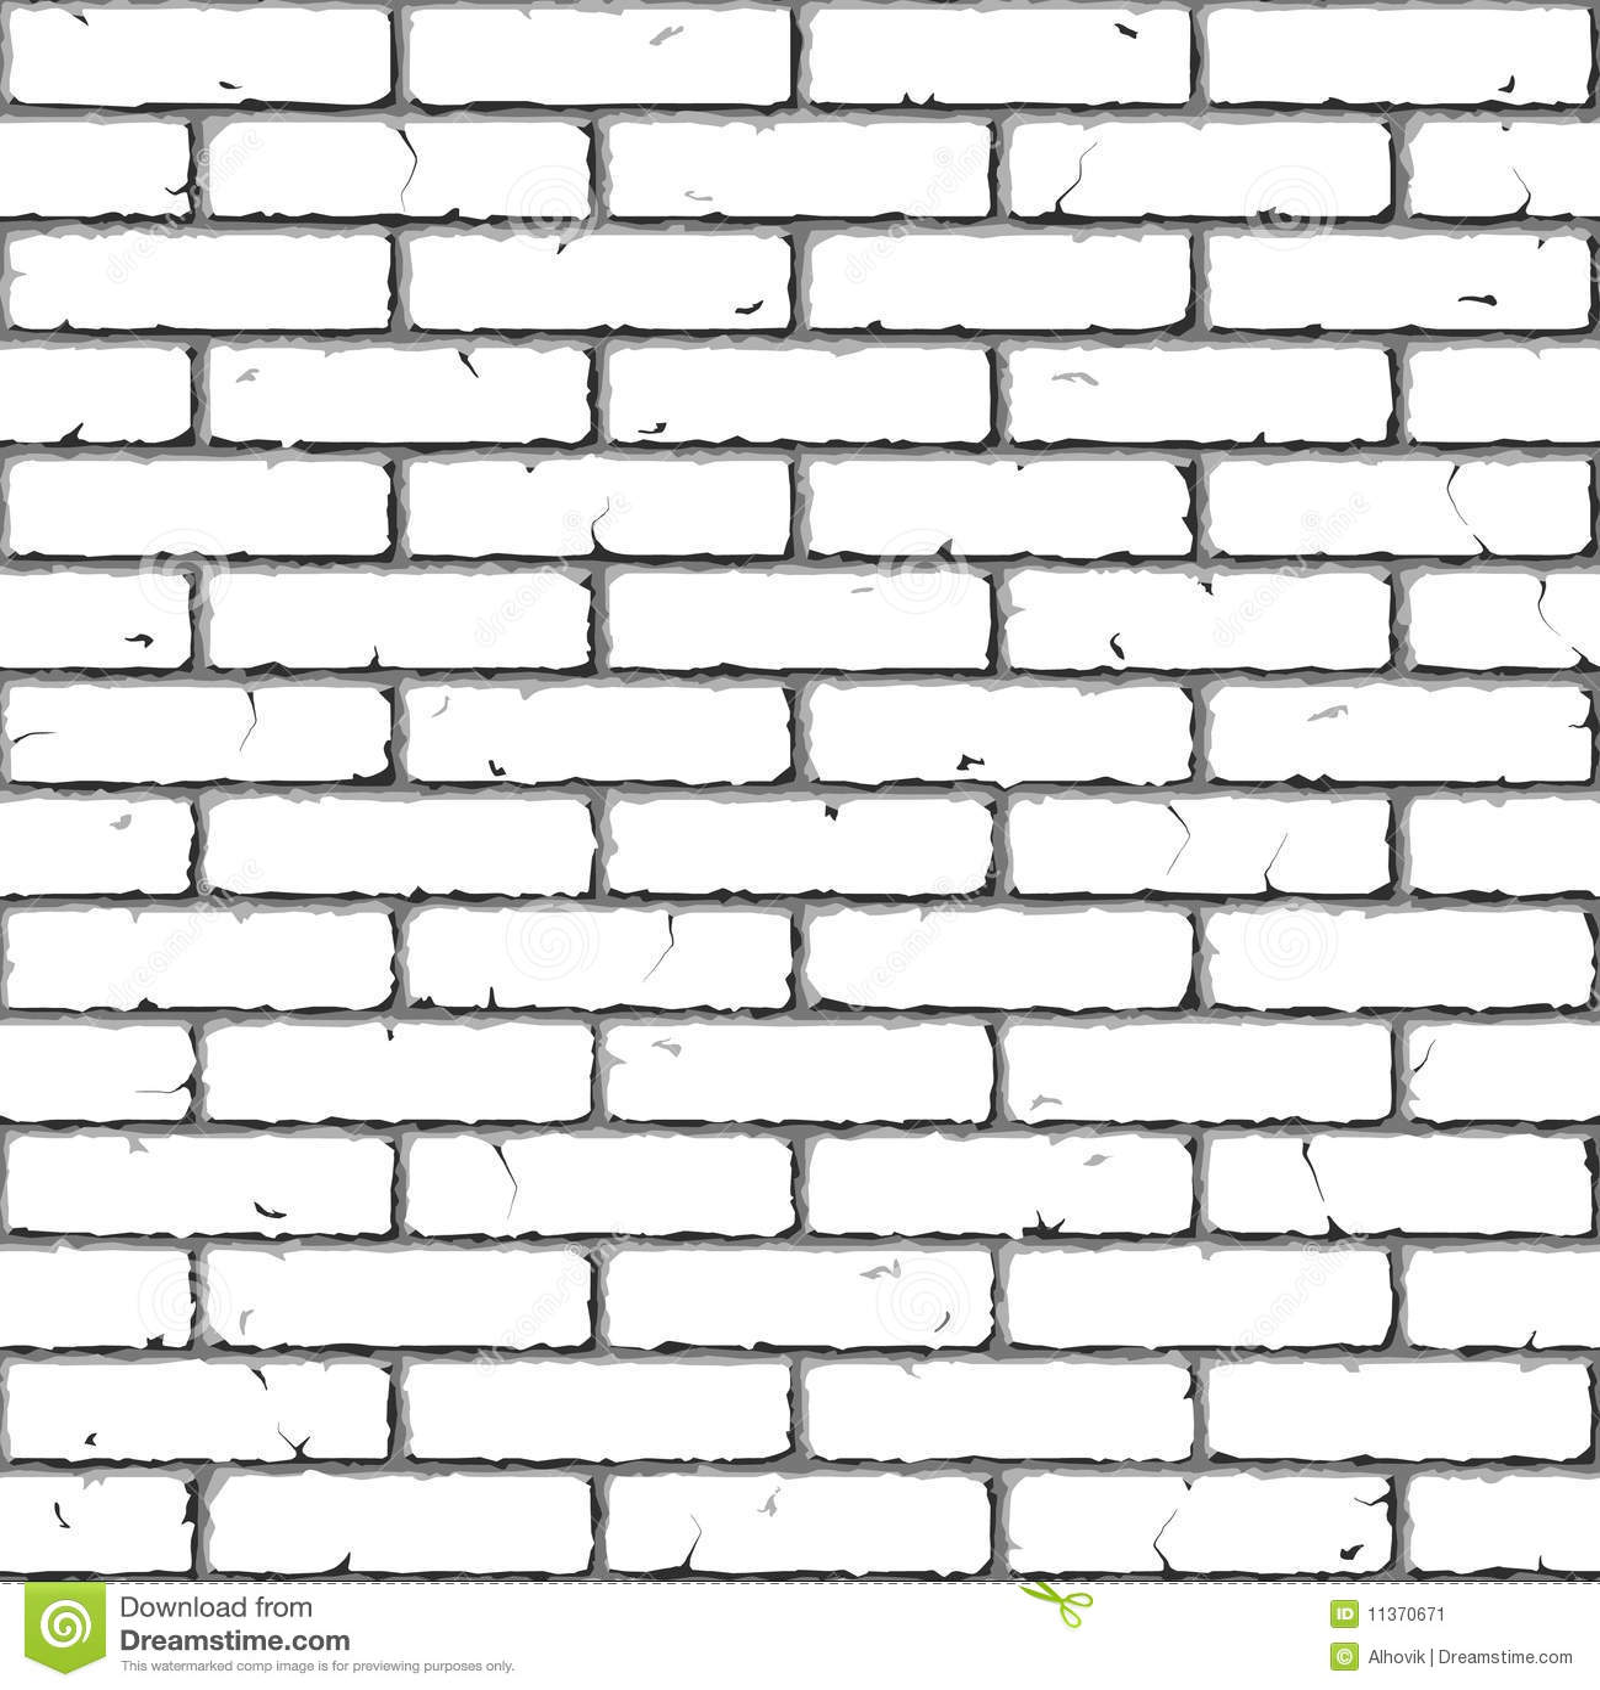 brick wall seamless illustration stock vector Cartoon Brick Stone Brick Wall Clip Art Template